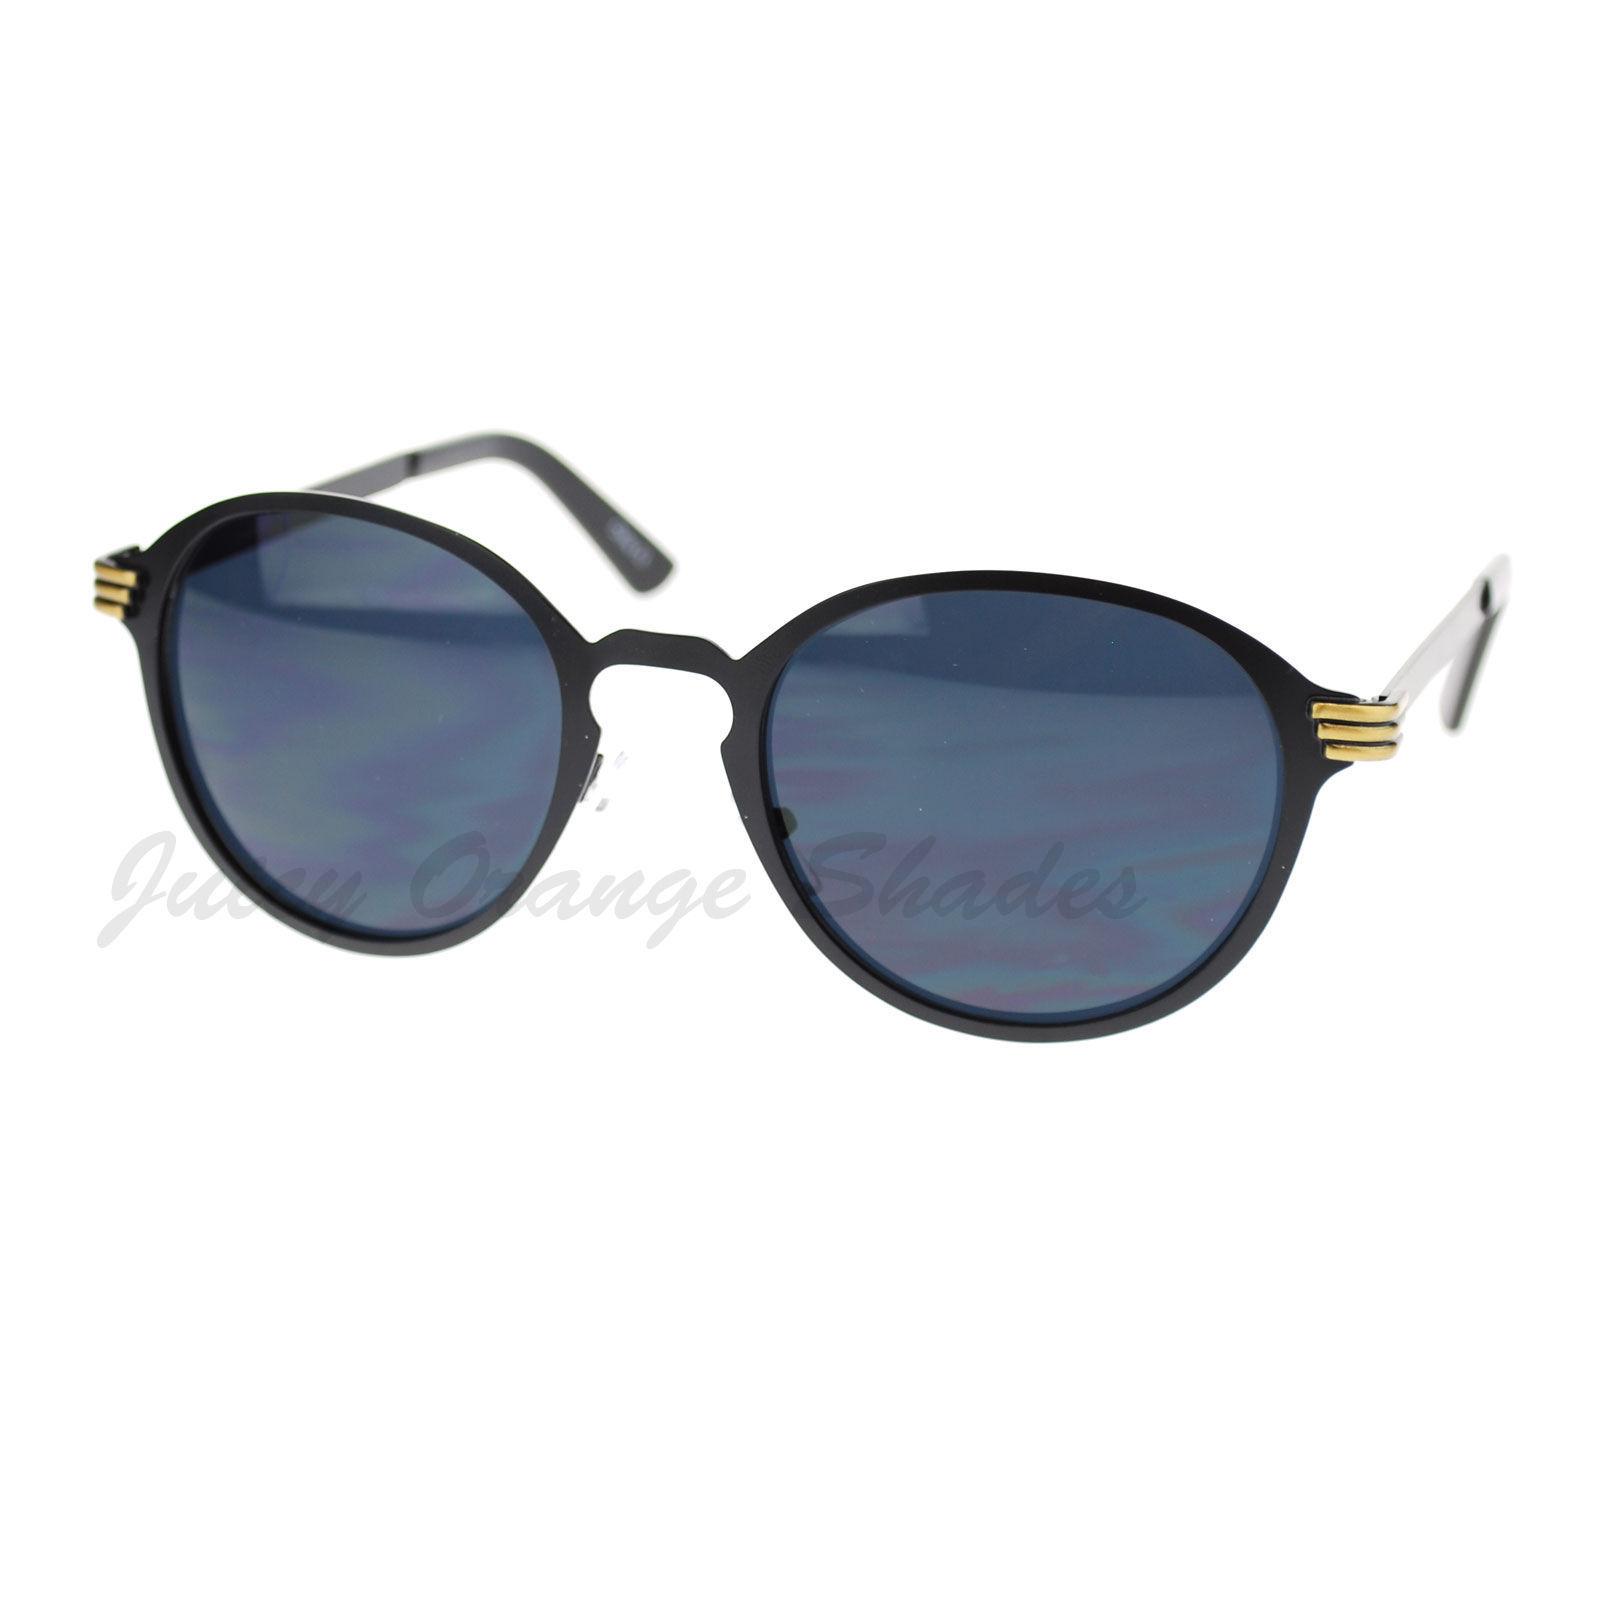 Womens Fashion Sunglasses Vintage Round Keyhole Metal Frame